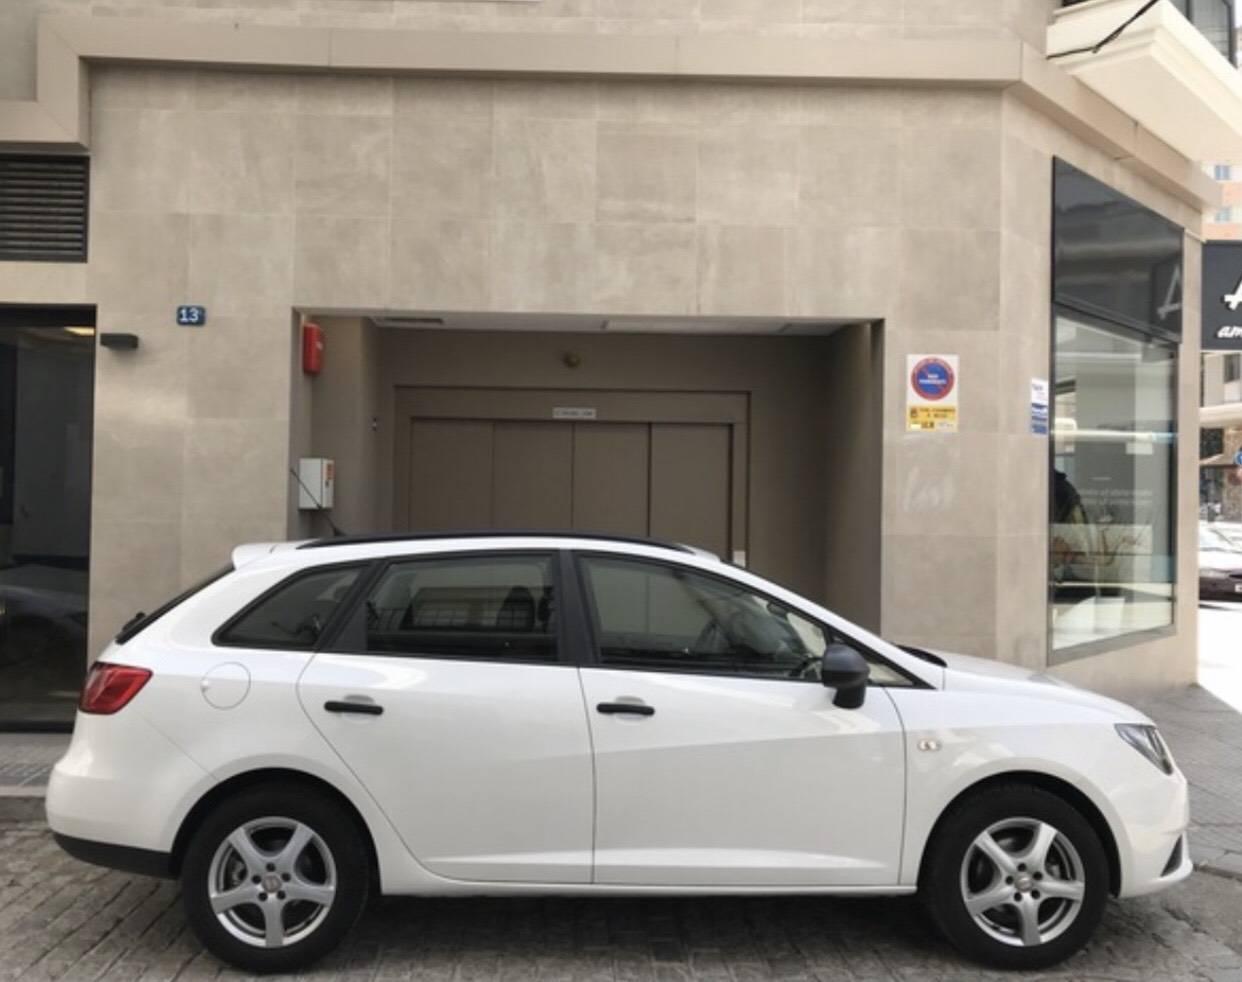 Acheter une voiture SEAT IBIZA ST 2016 1.2 TSI 90CV d'occasion à Málaga. Avec la garantie de Larios Rental